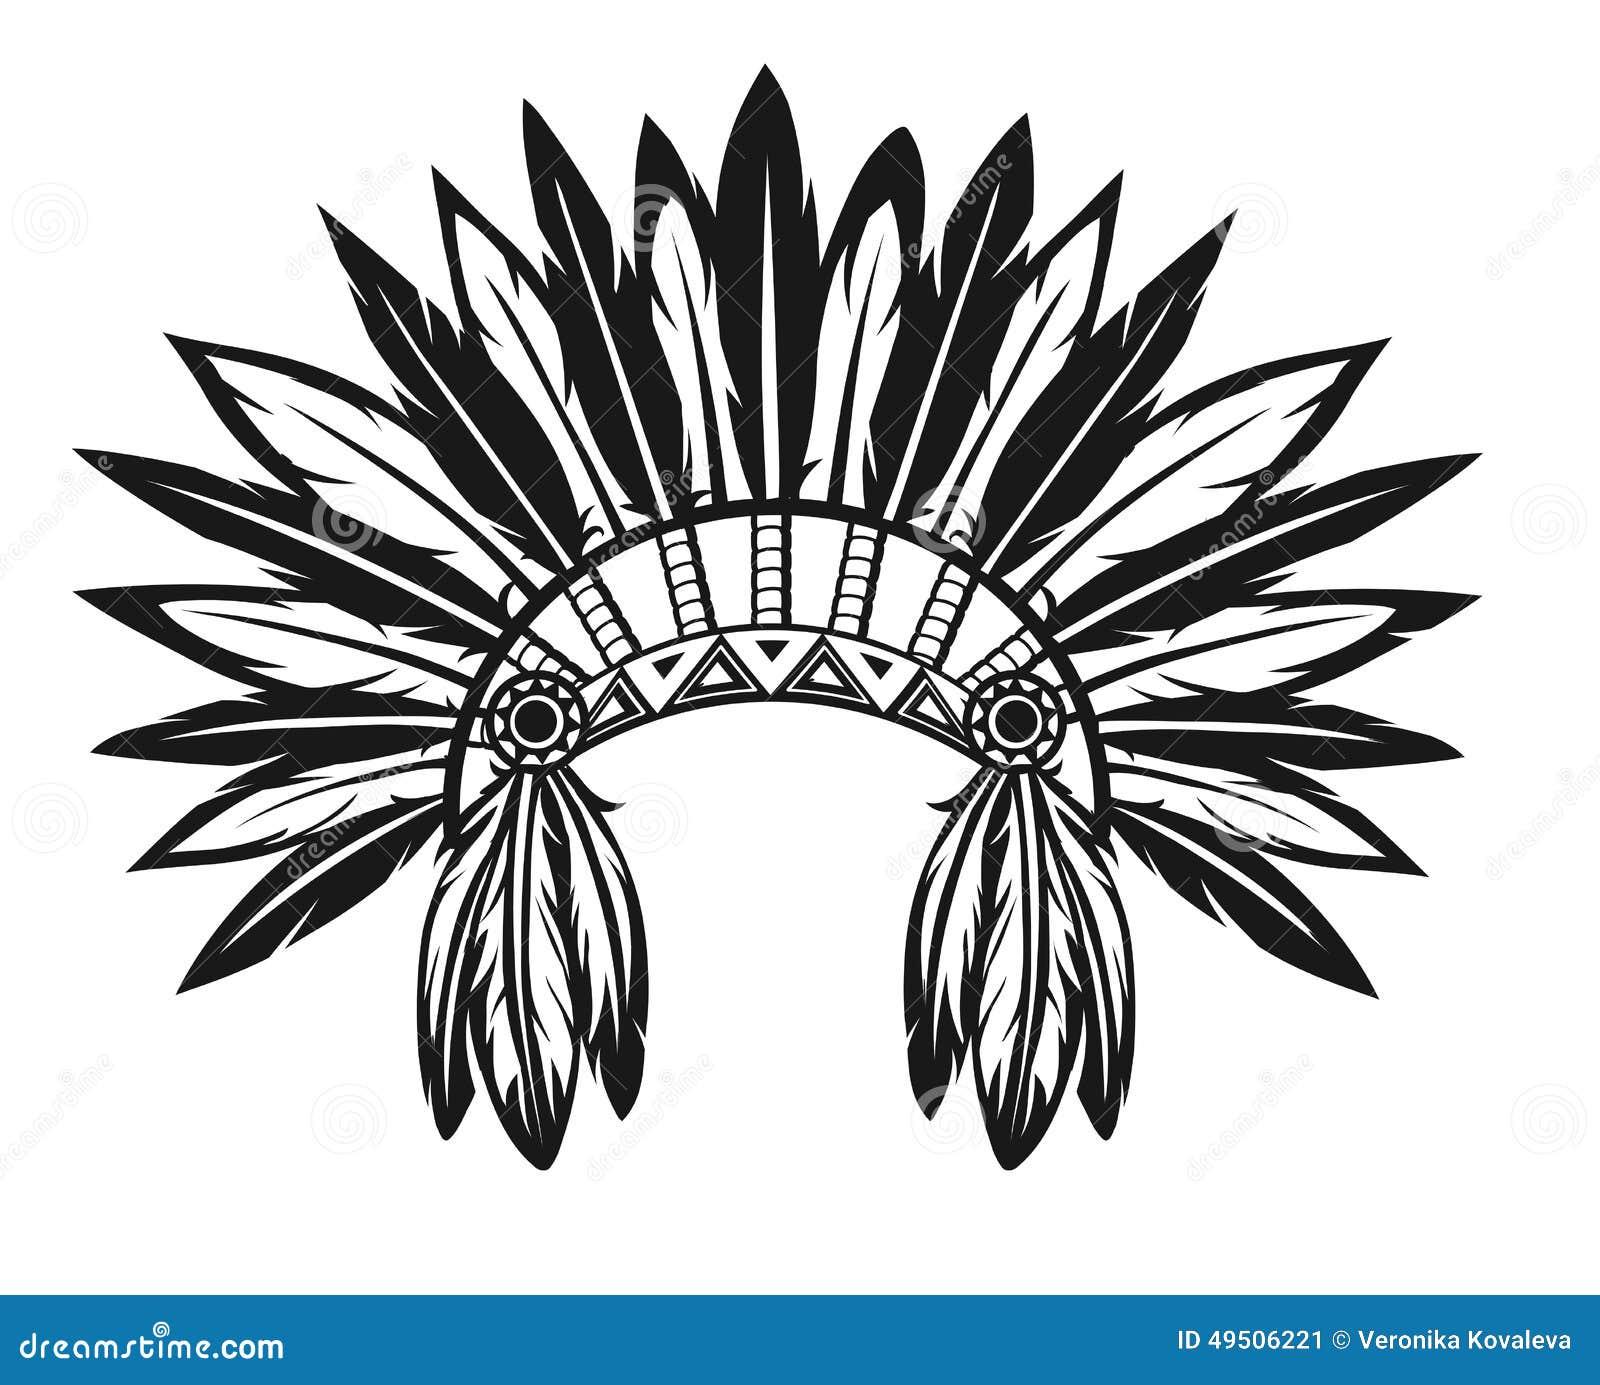 native american free wallpaper